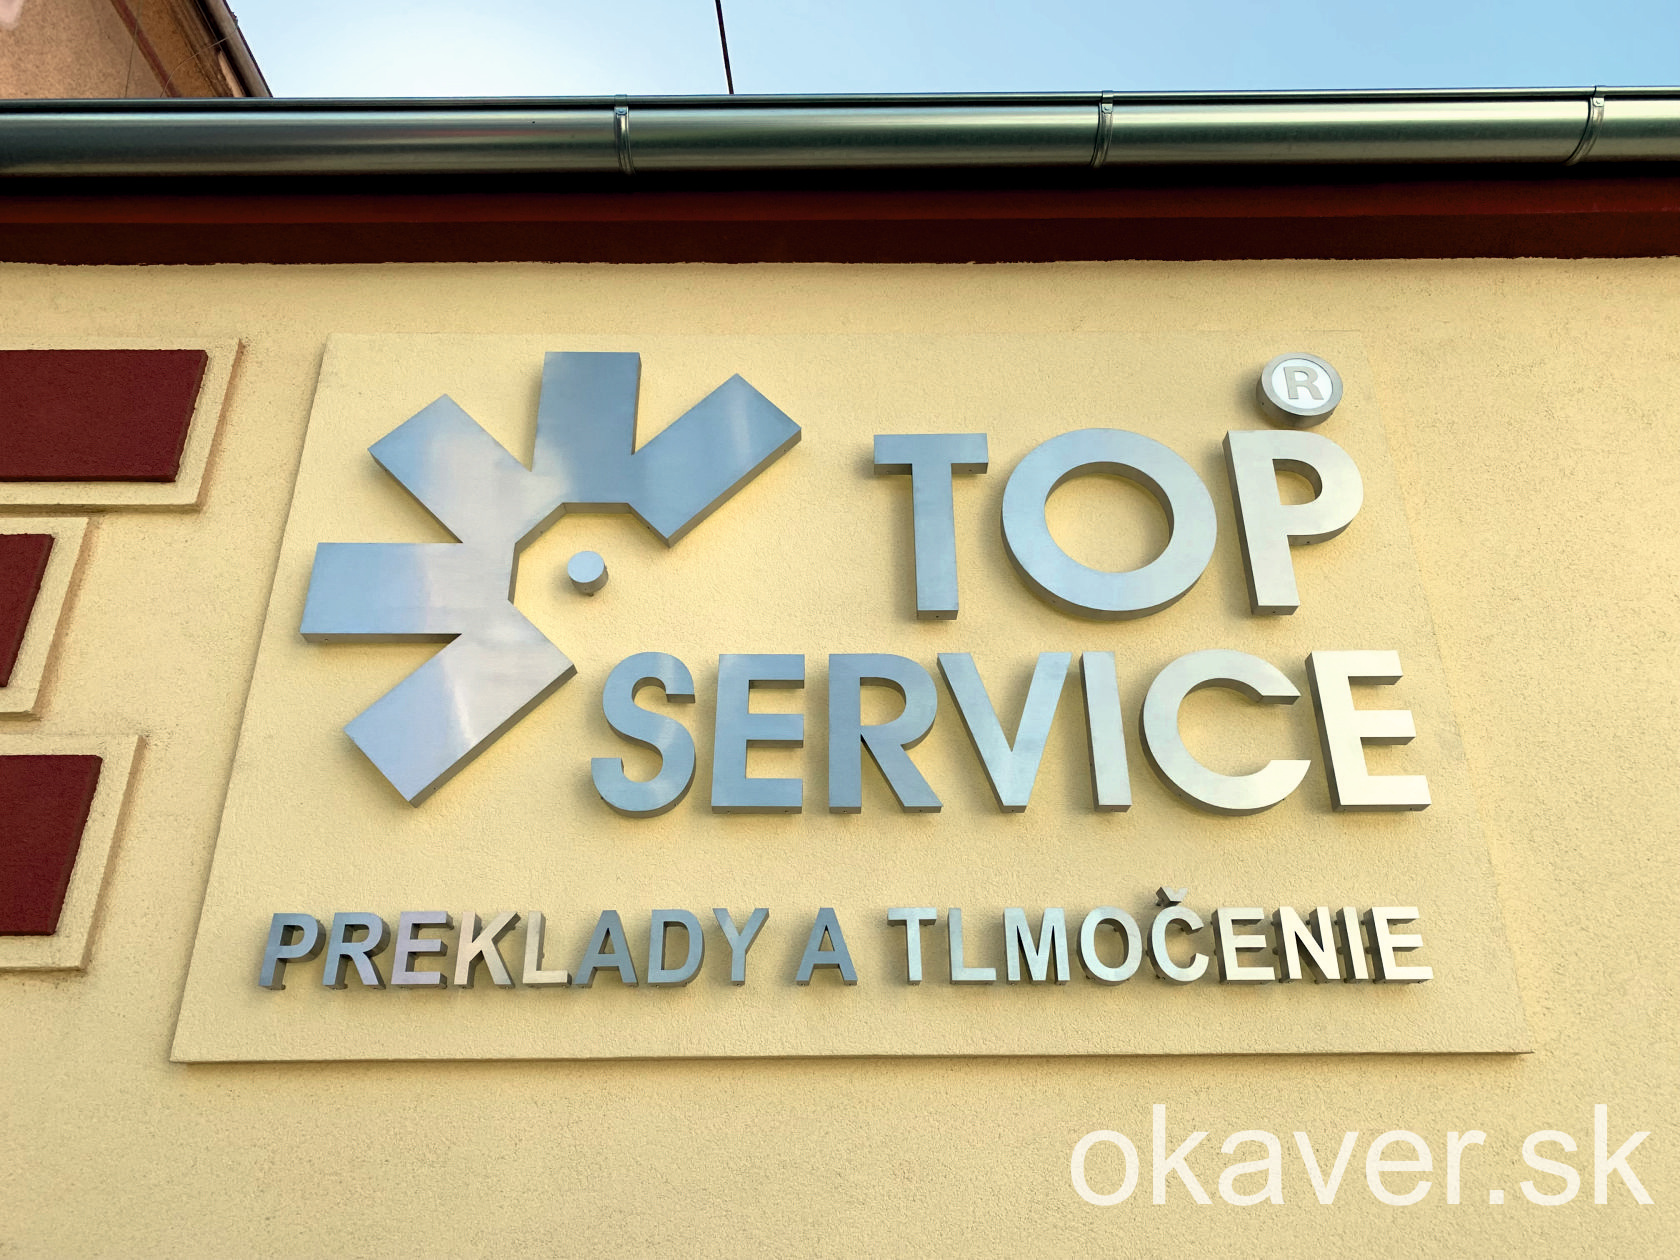 TOP SERVICE - Nitra, okaver,sk